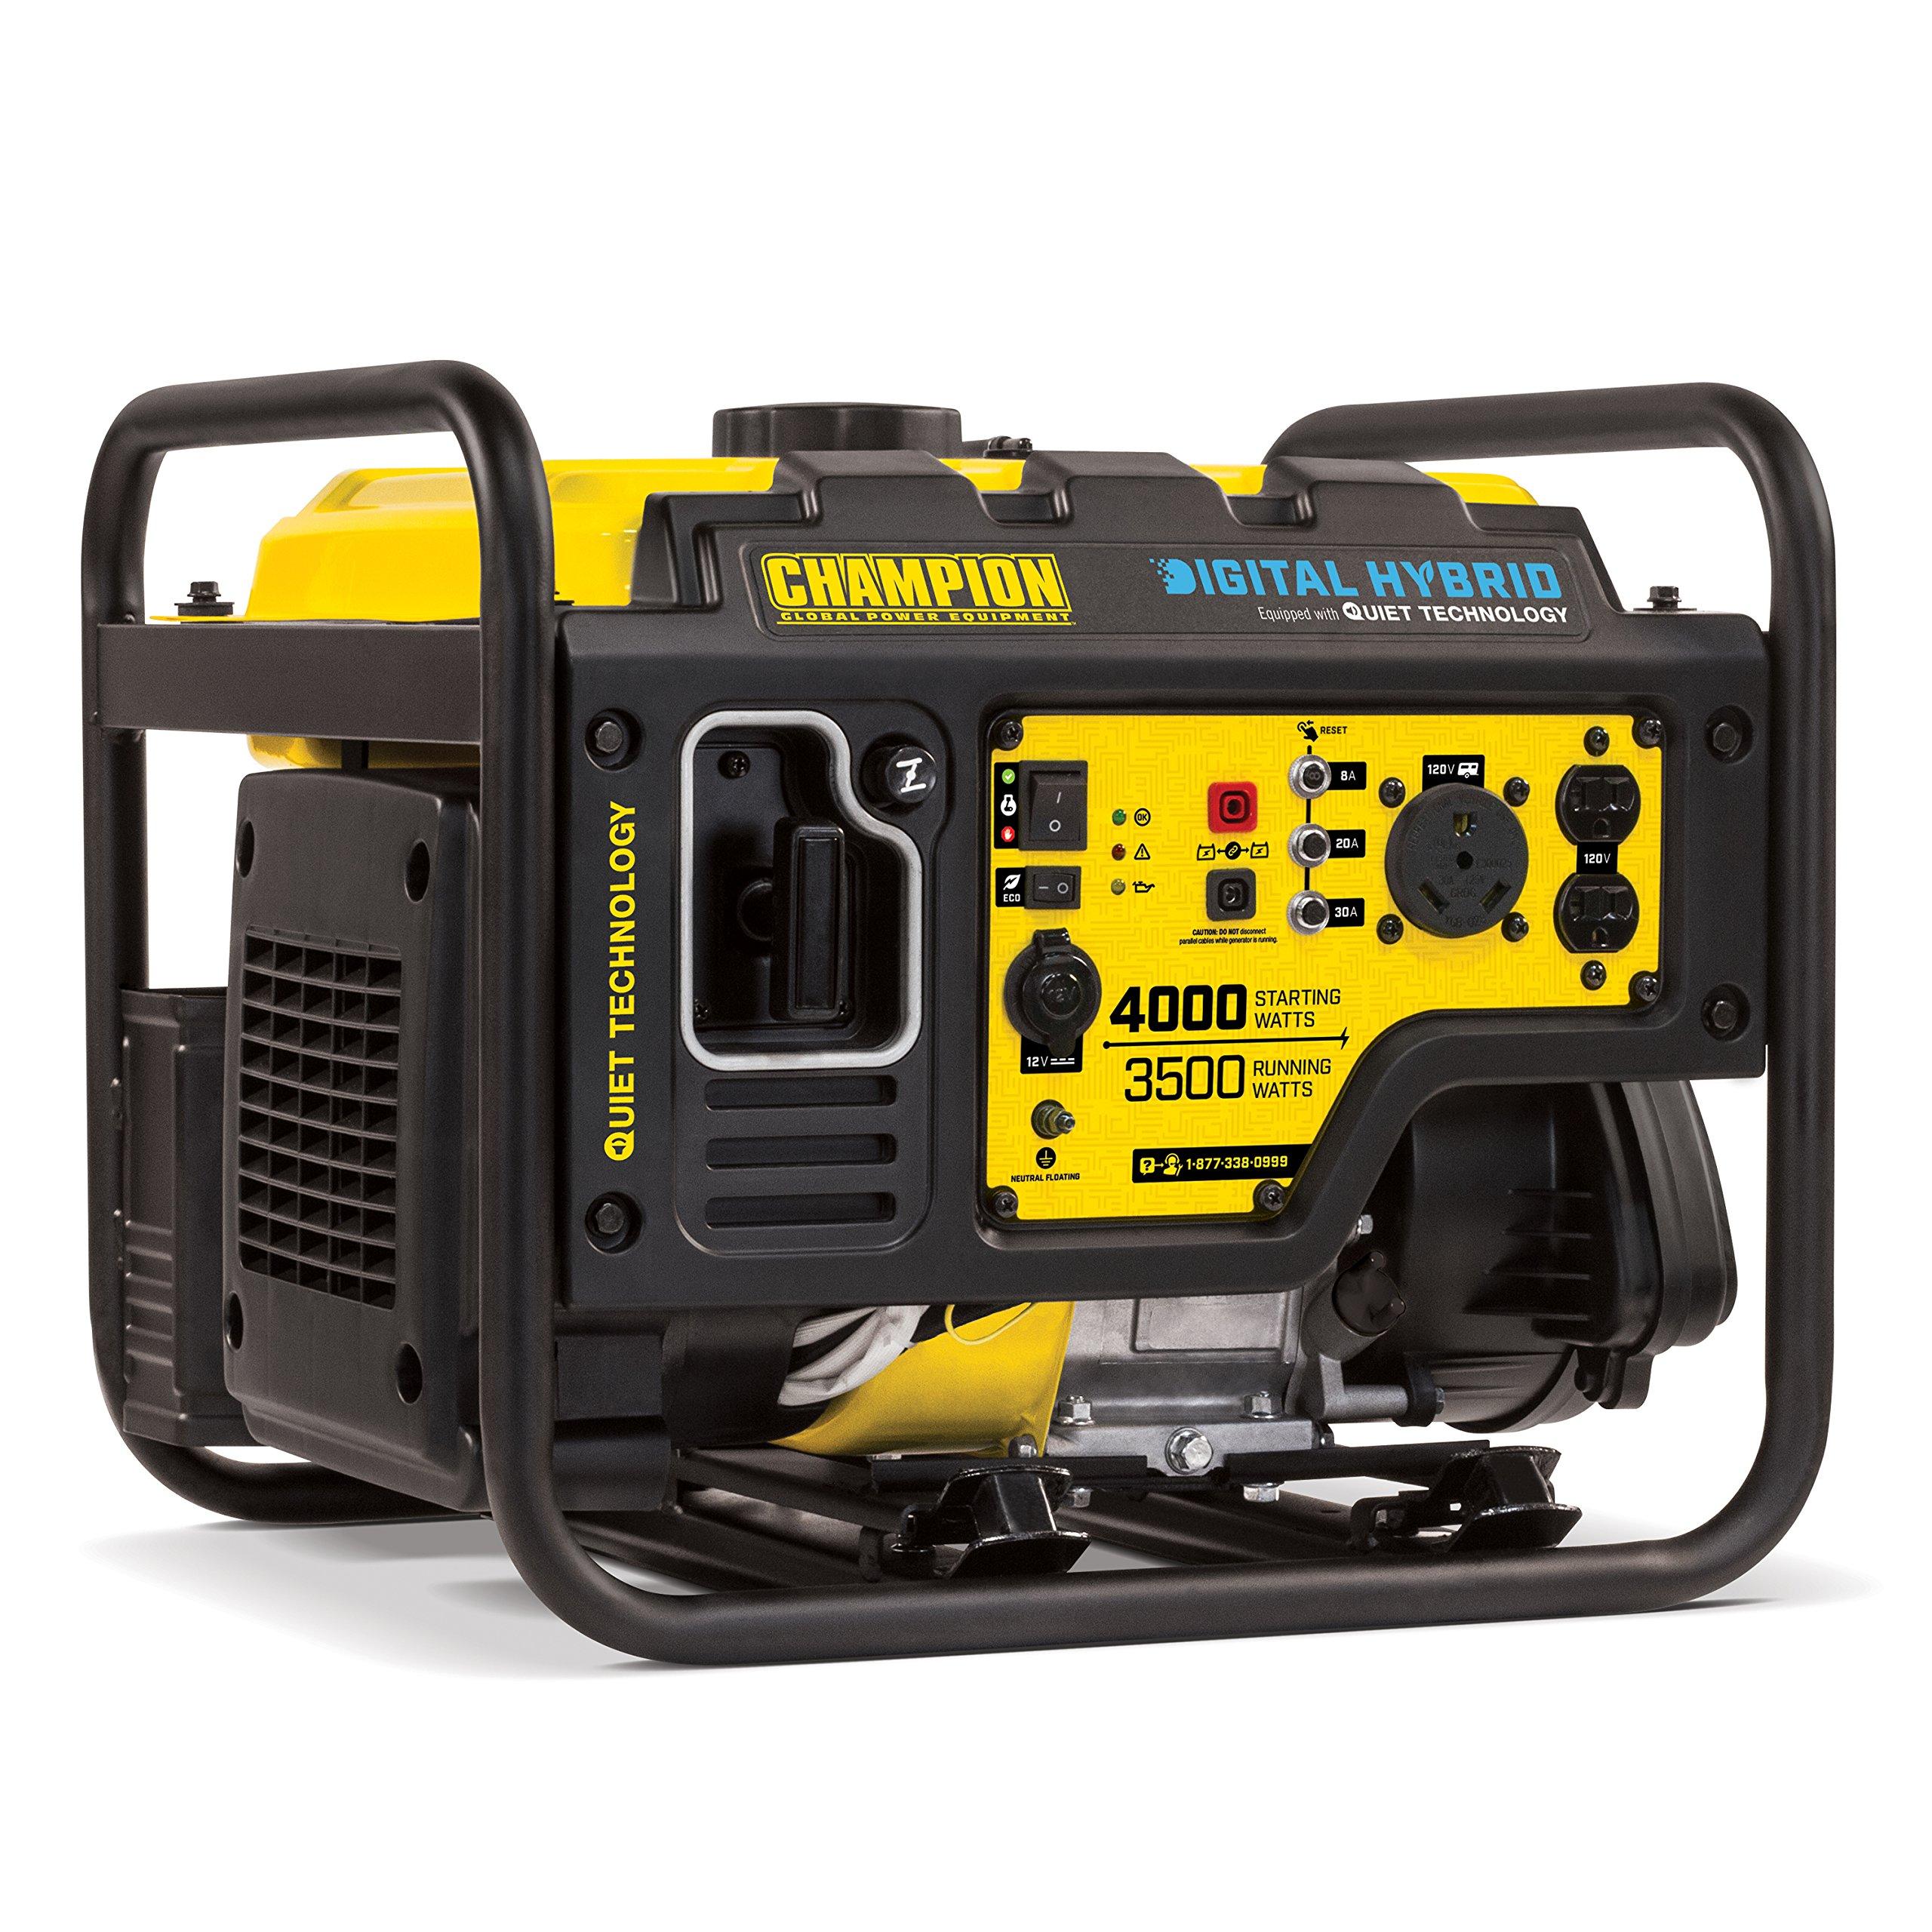 Champion 3500-Watt RV Ready Digital Hybrid Portable Generator with Quiet Technology by Champion Power Equipment